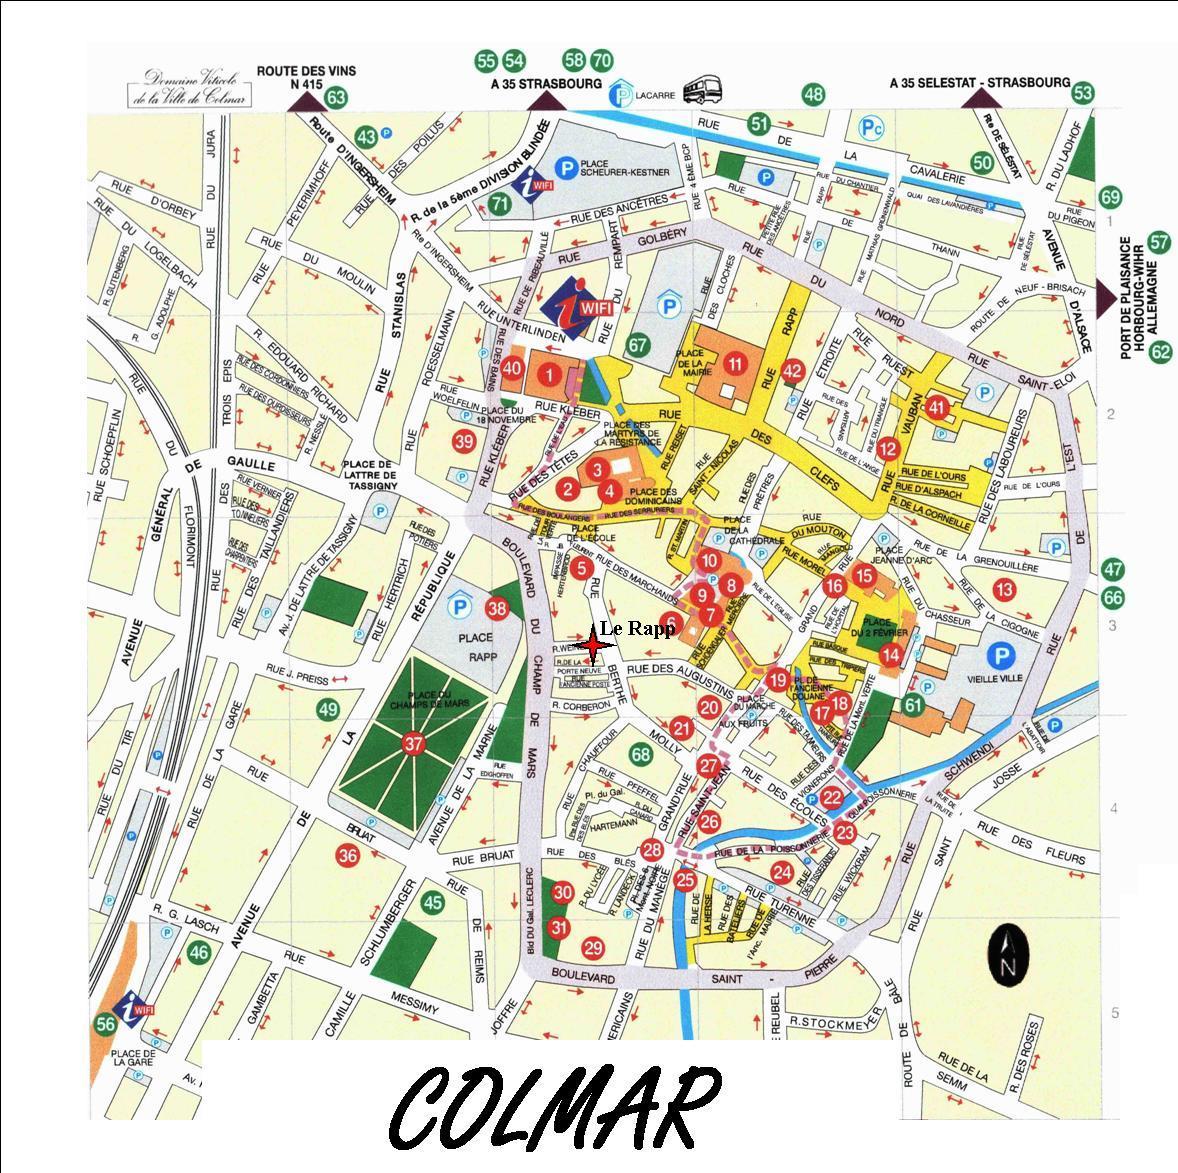 Ville De Colmar Plan